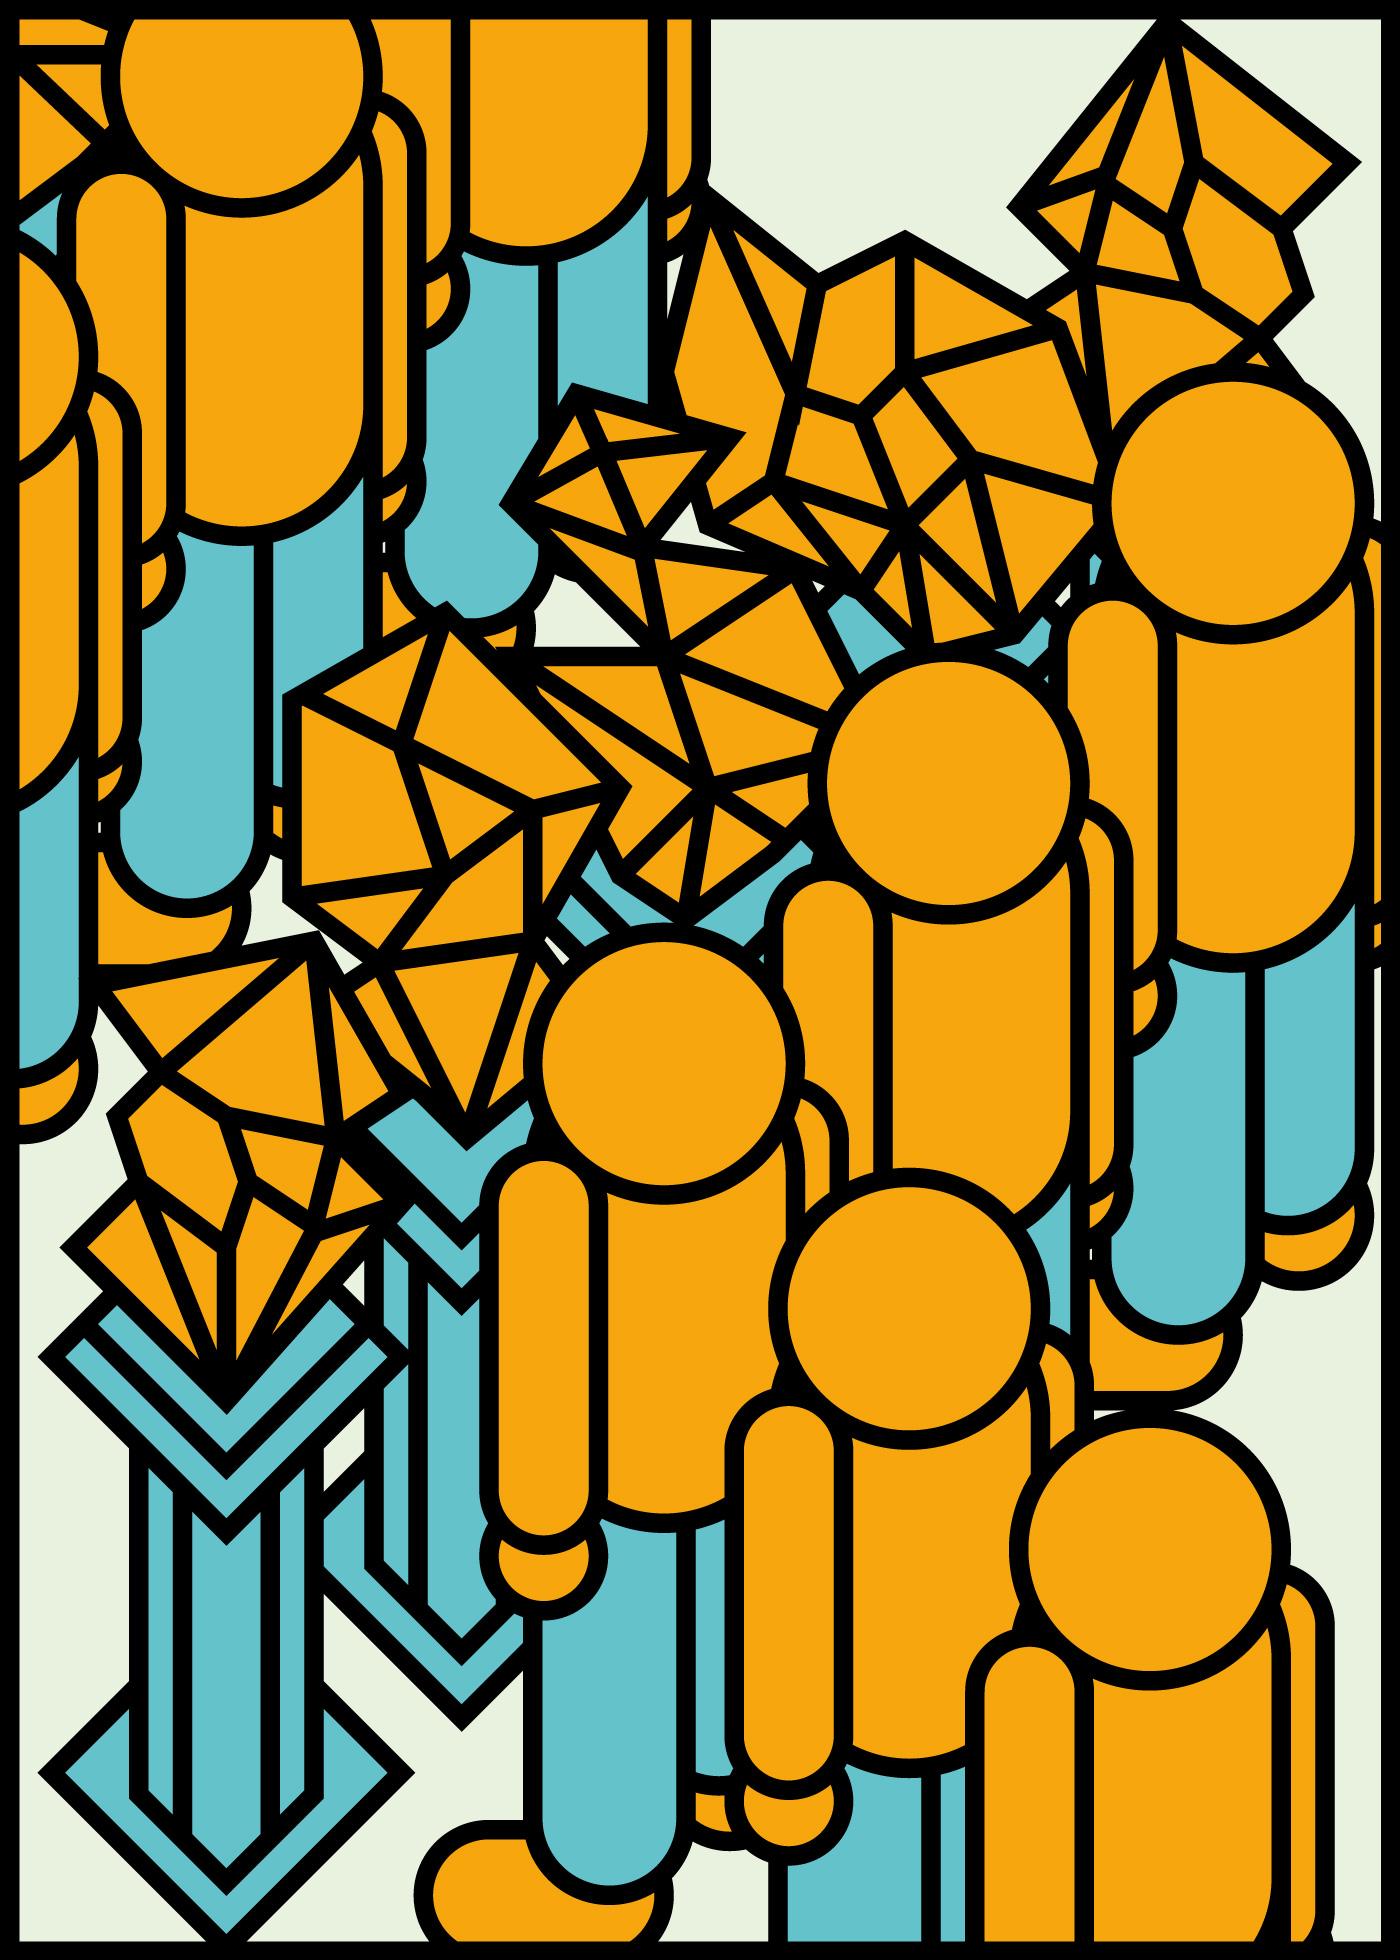 Jari Johannes Blank Poster